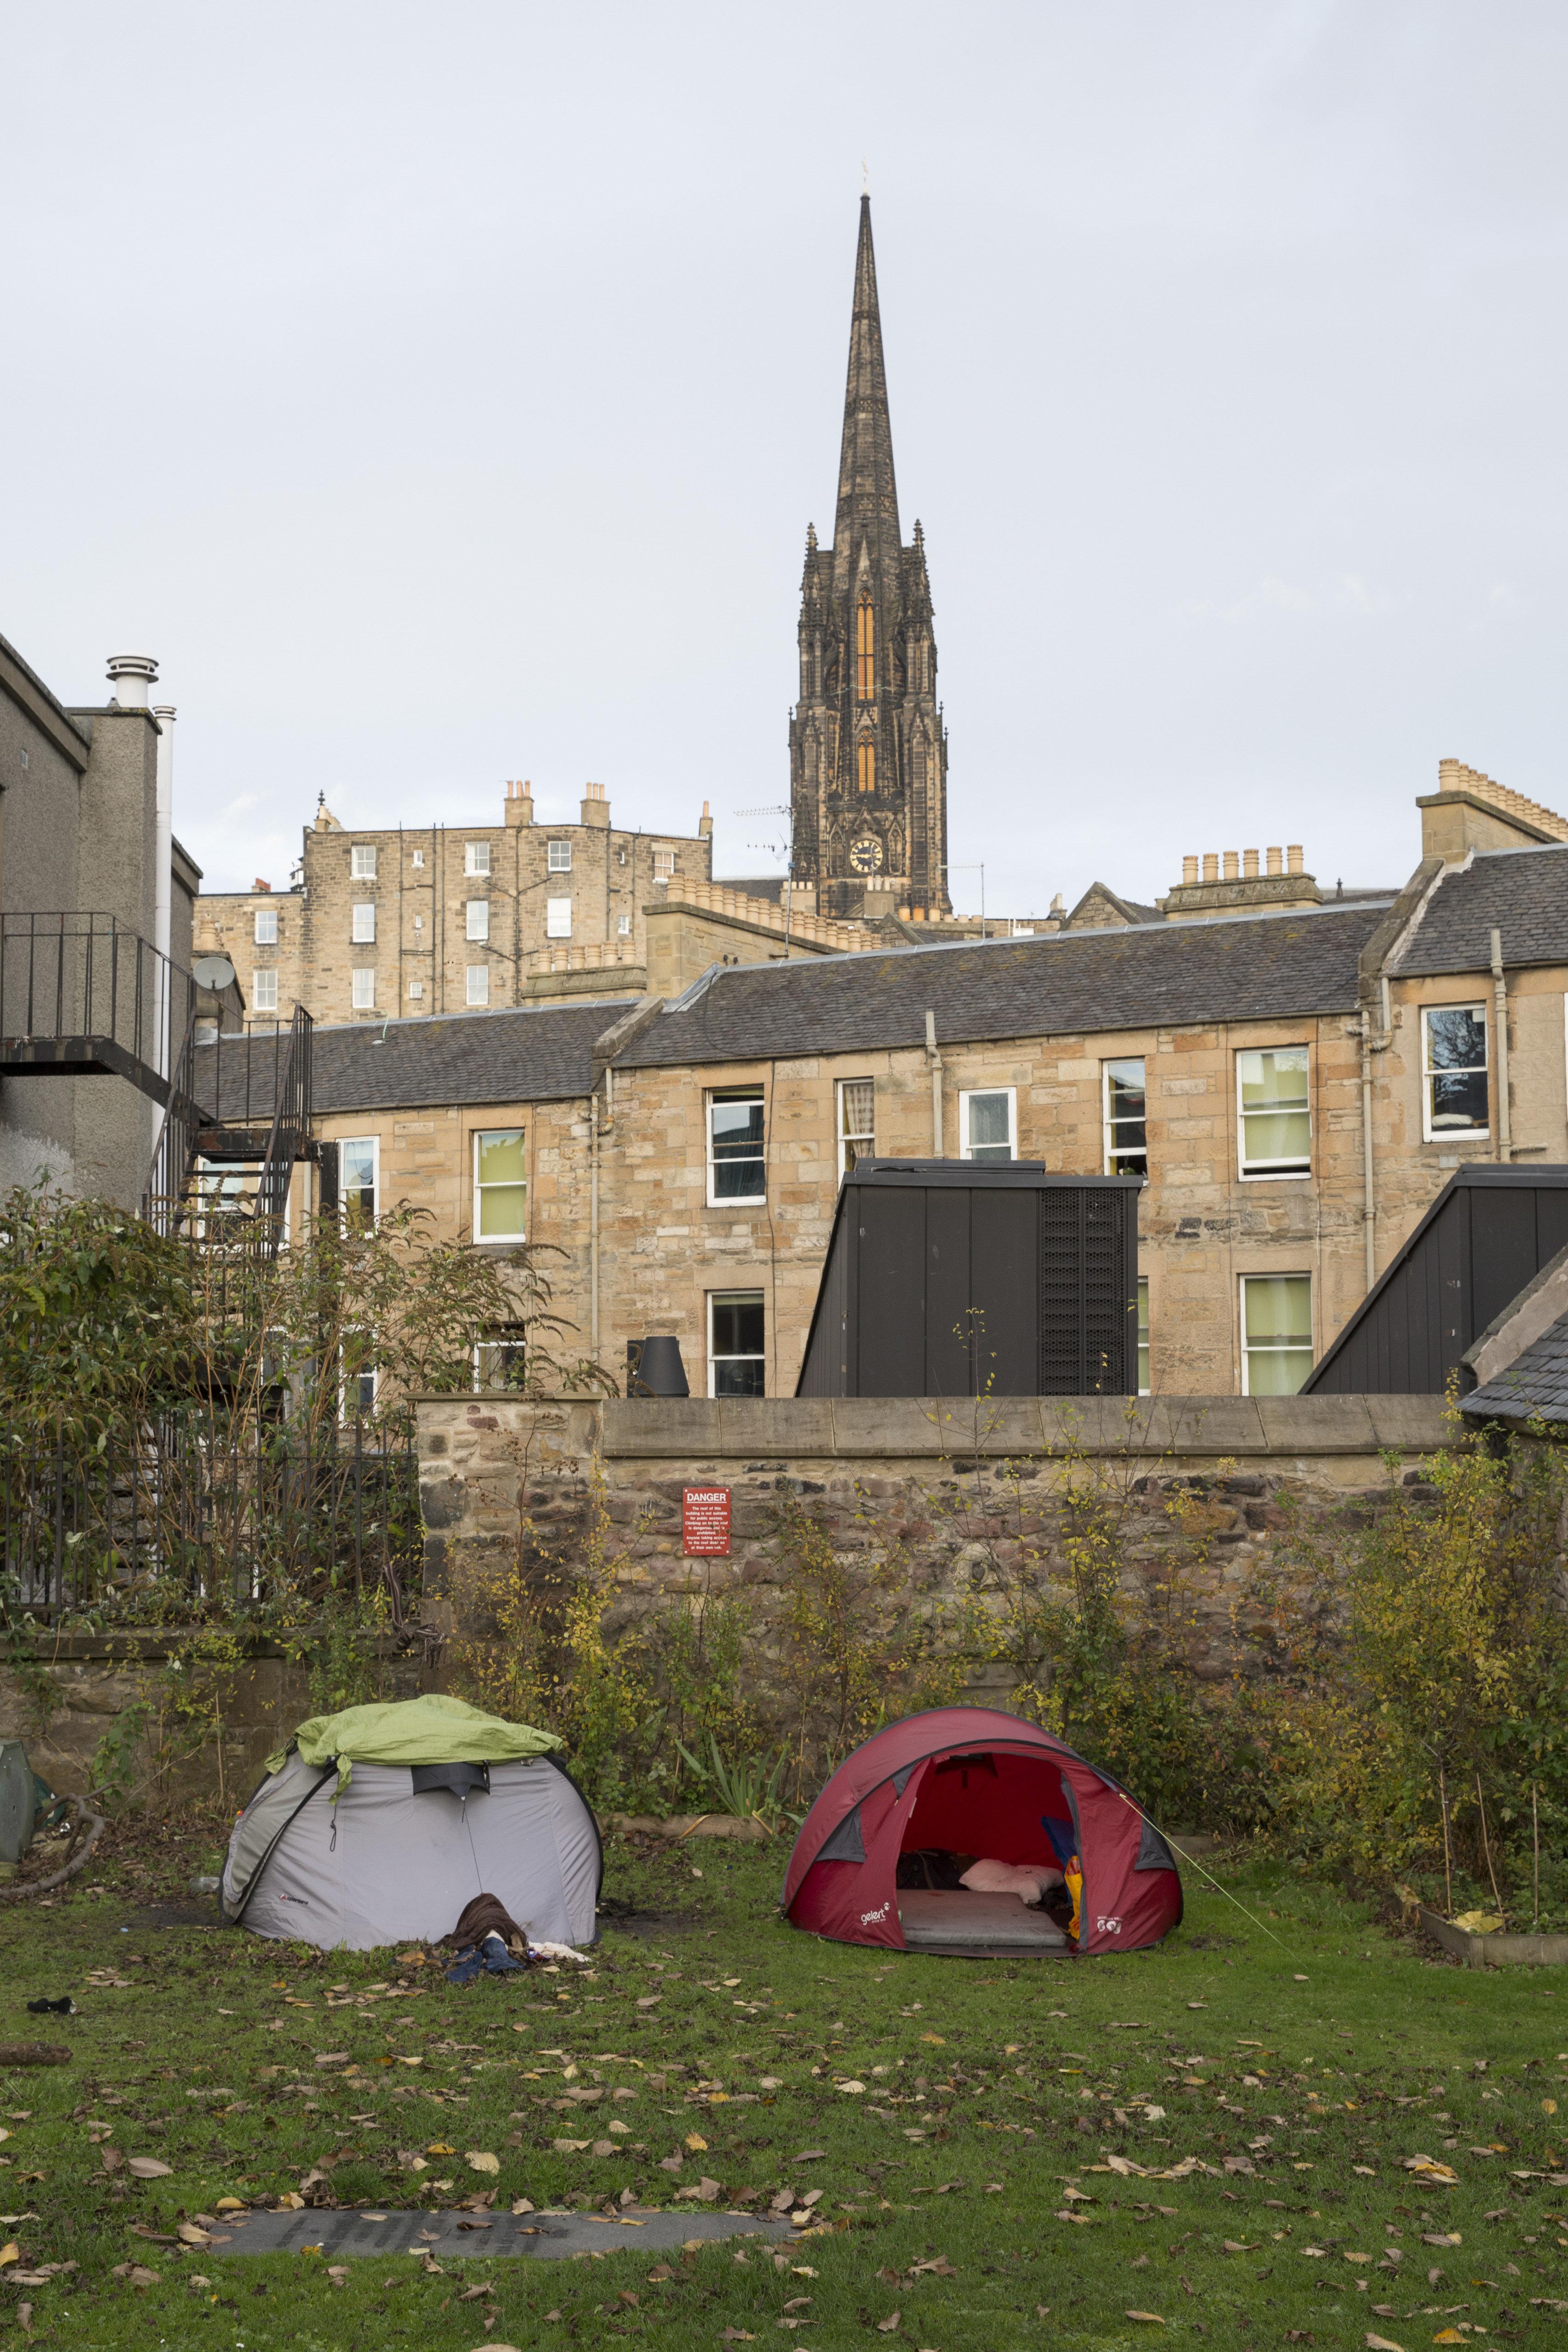 'Housing Emergency' As Calls To Homelessness Helpline Soar, Shelter